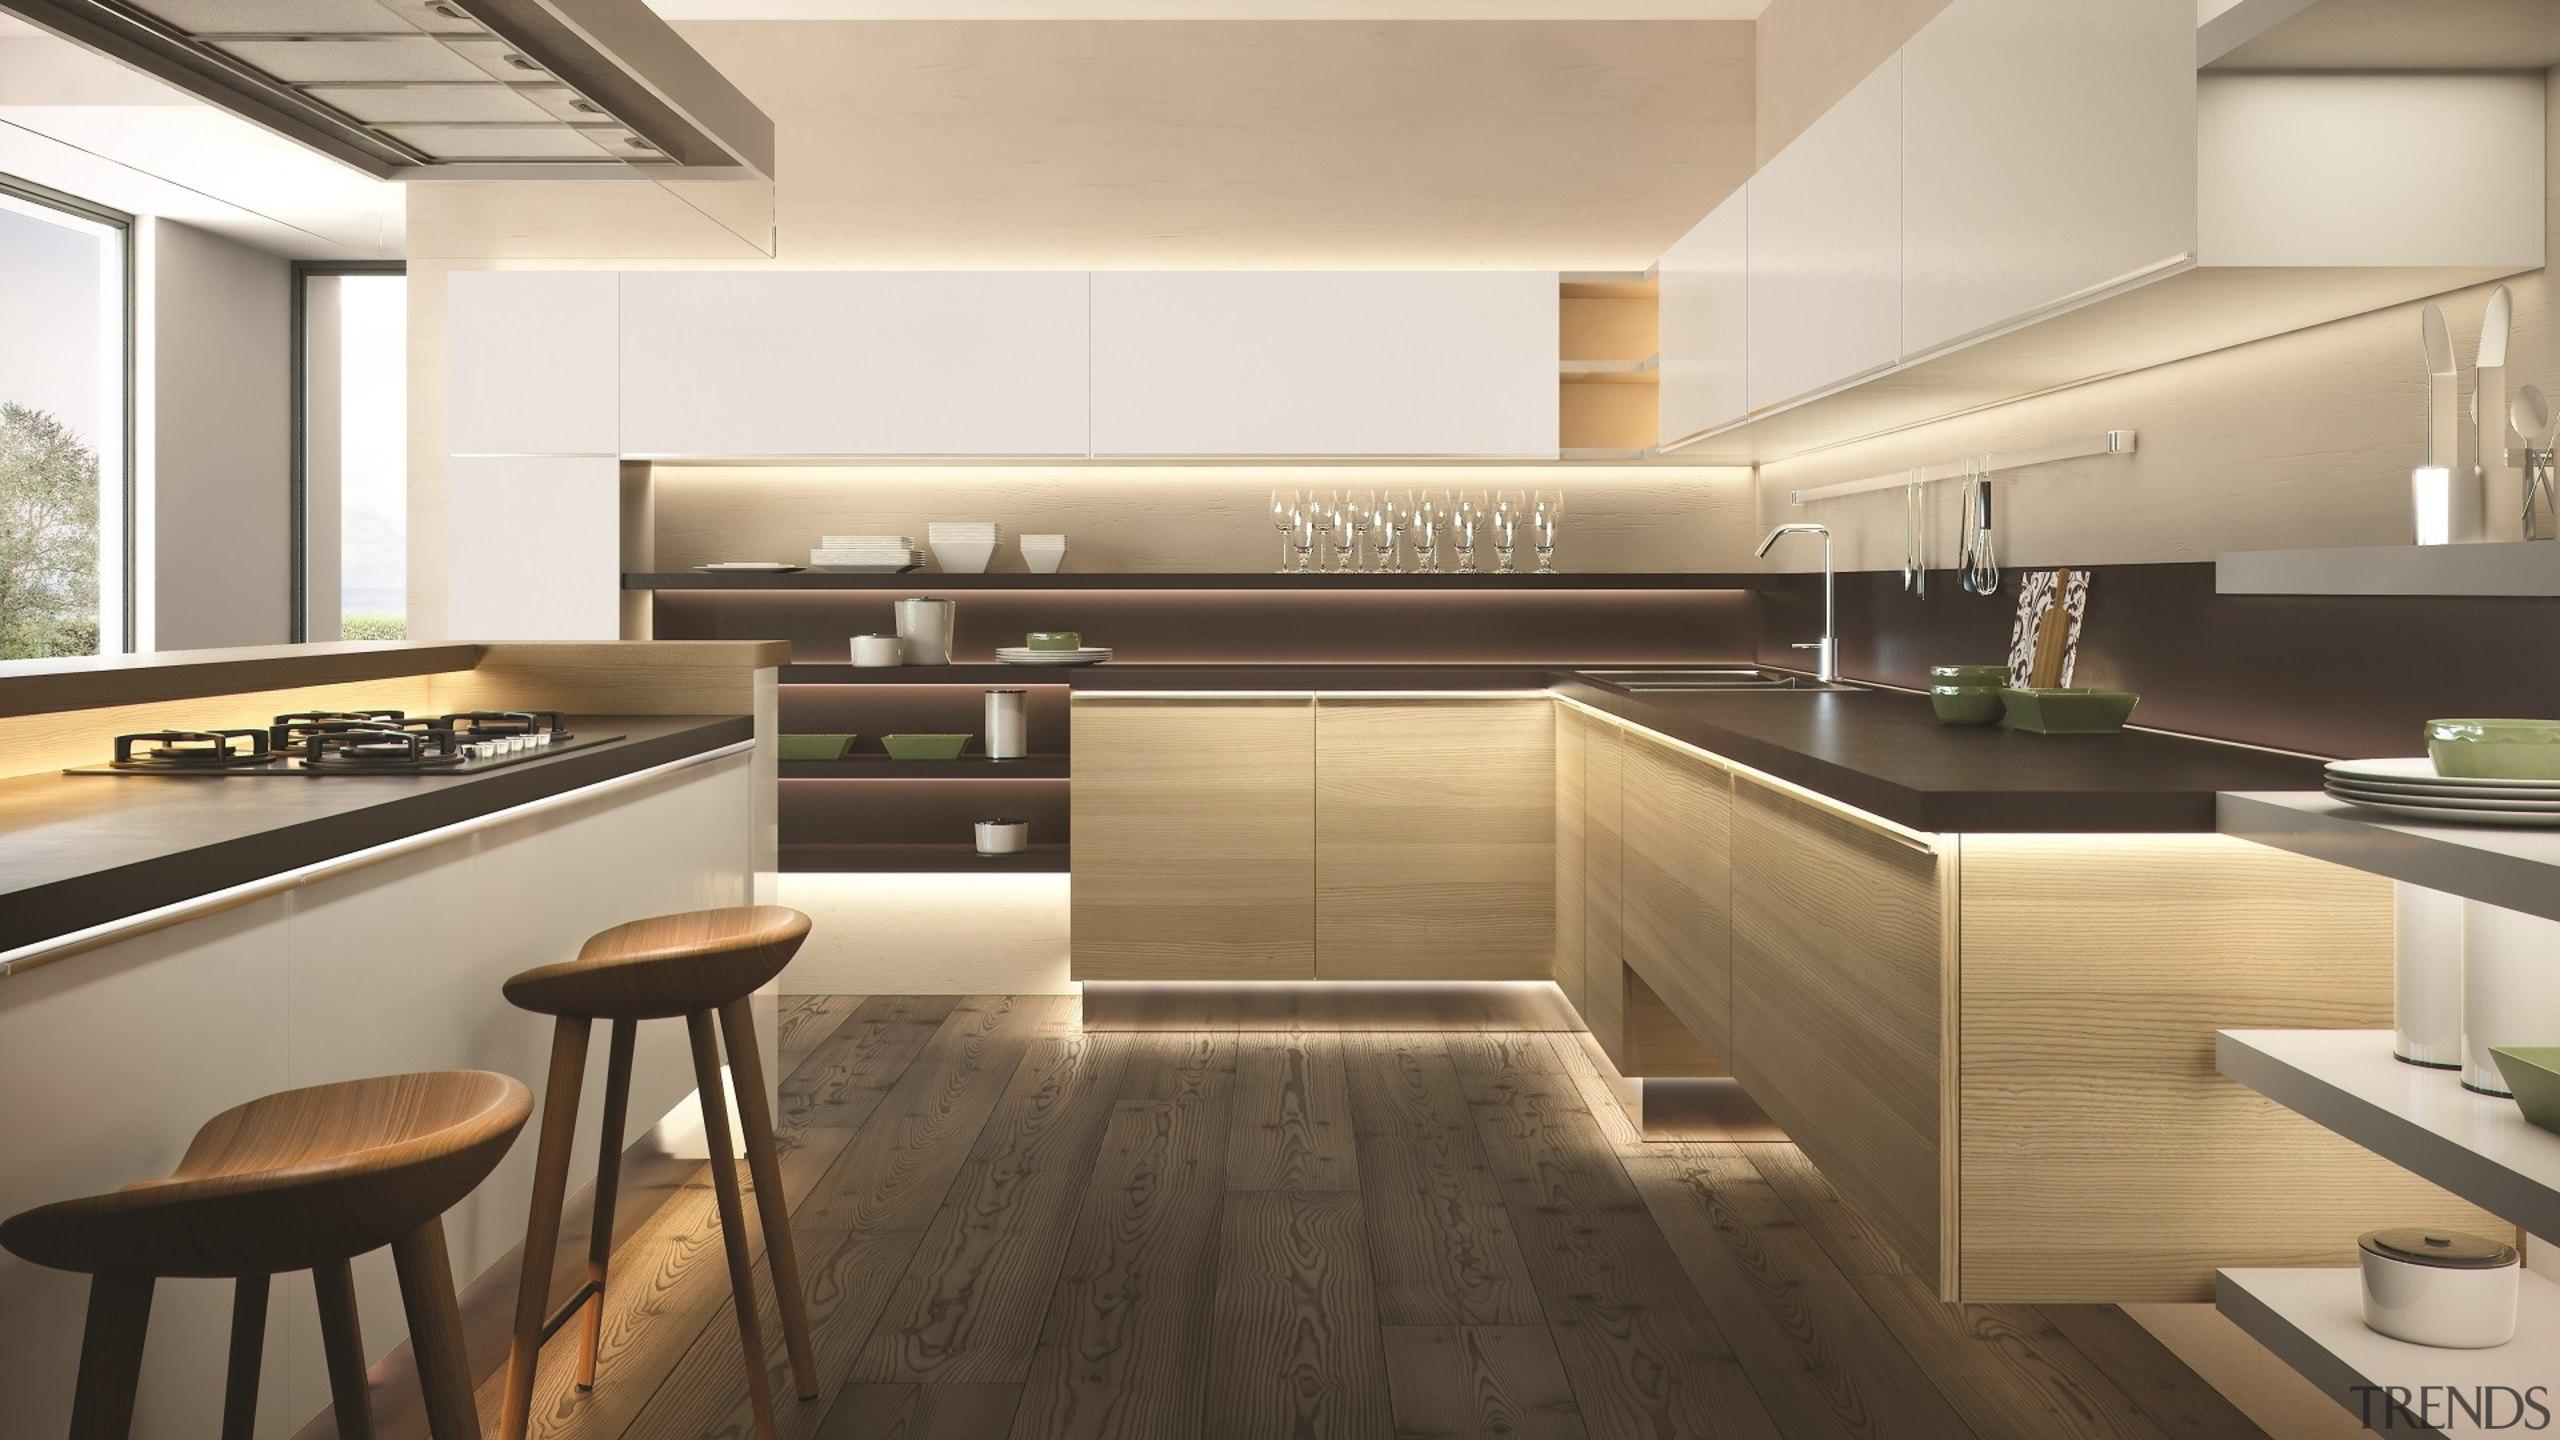 Domus Line Flexible Led Strip In Toekick And cabinetry, countertop, cuisine classique, floor, interior design, kitchen, white